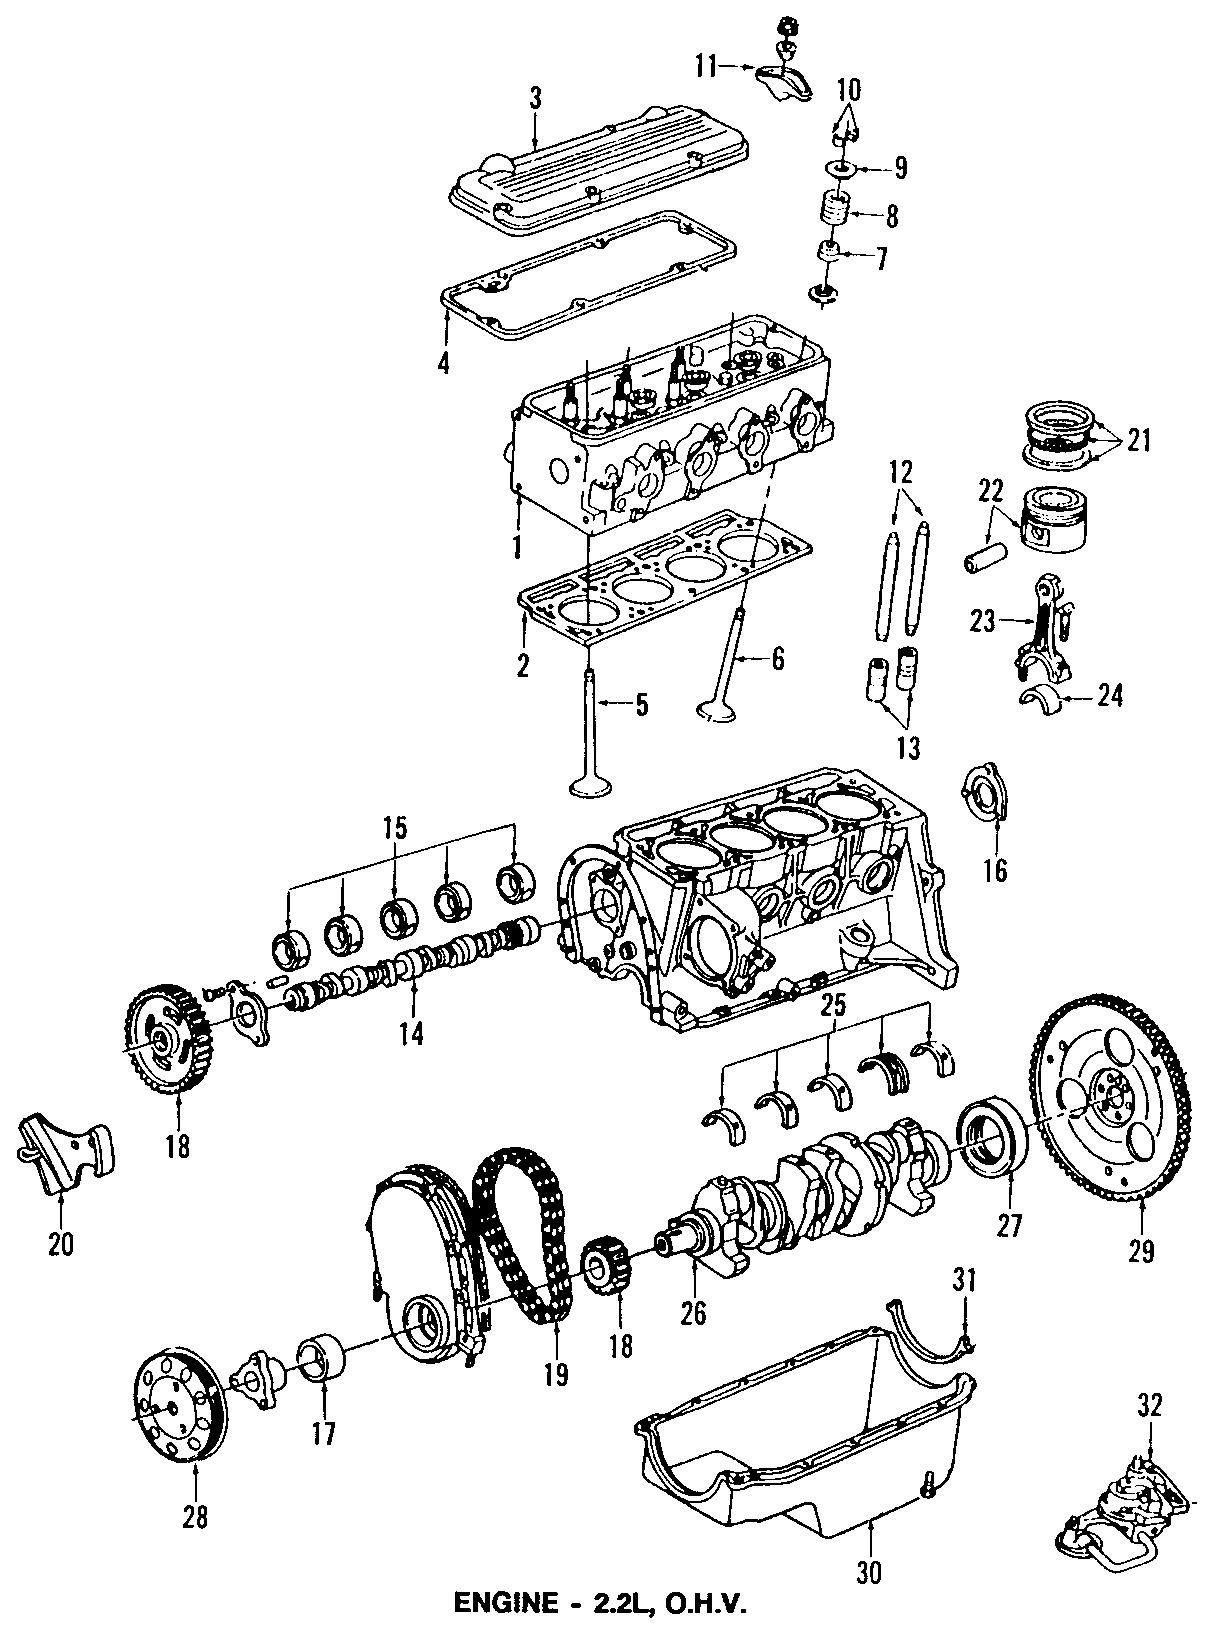 Pontiac Sunfire Engine Cylinder Head Gasket. Cavalier